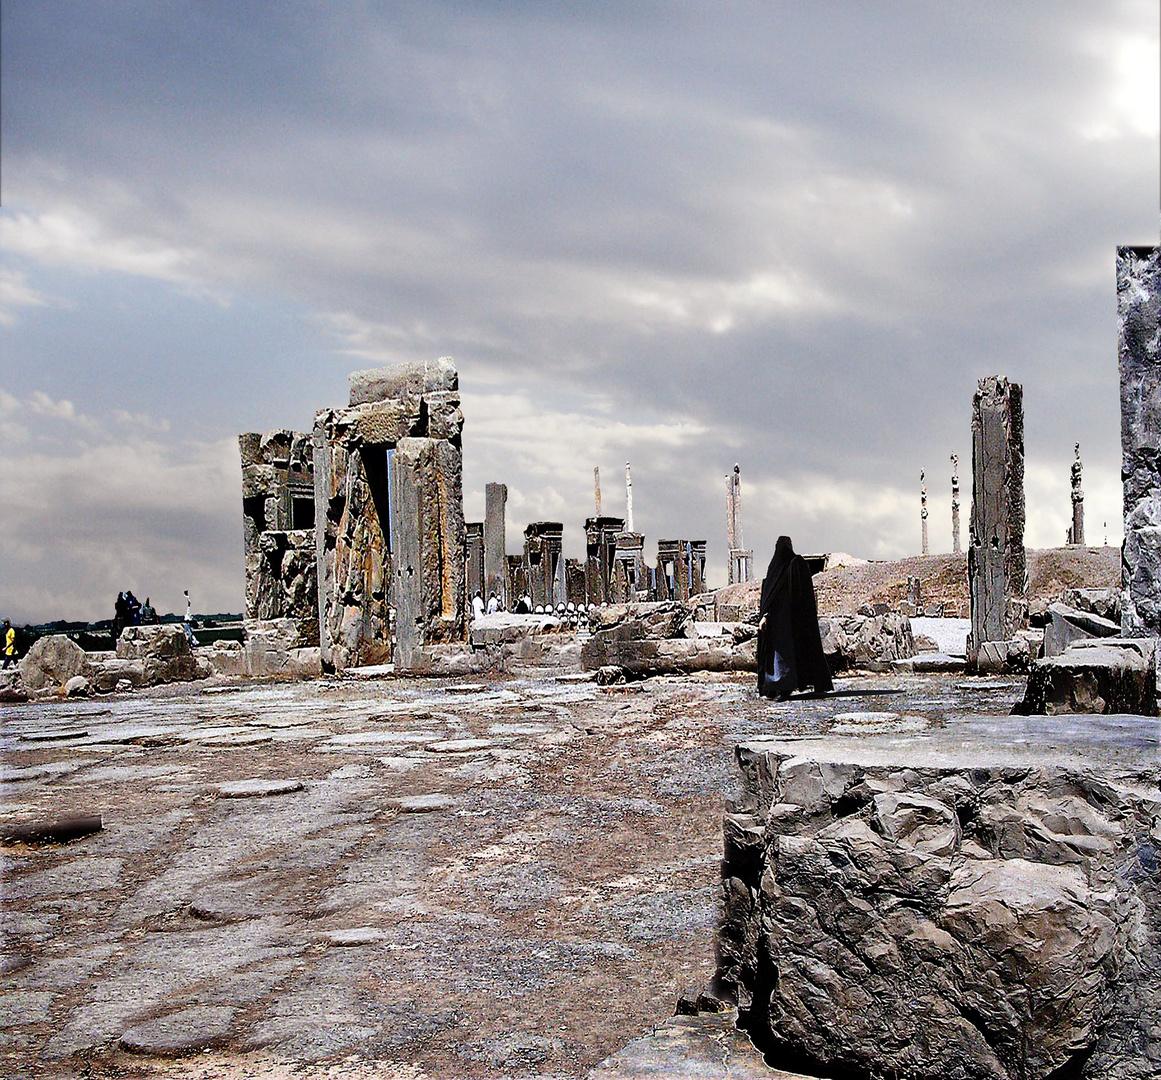 From Zoroaster to Islam 2